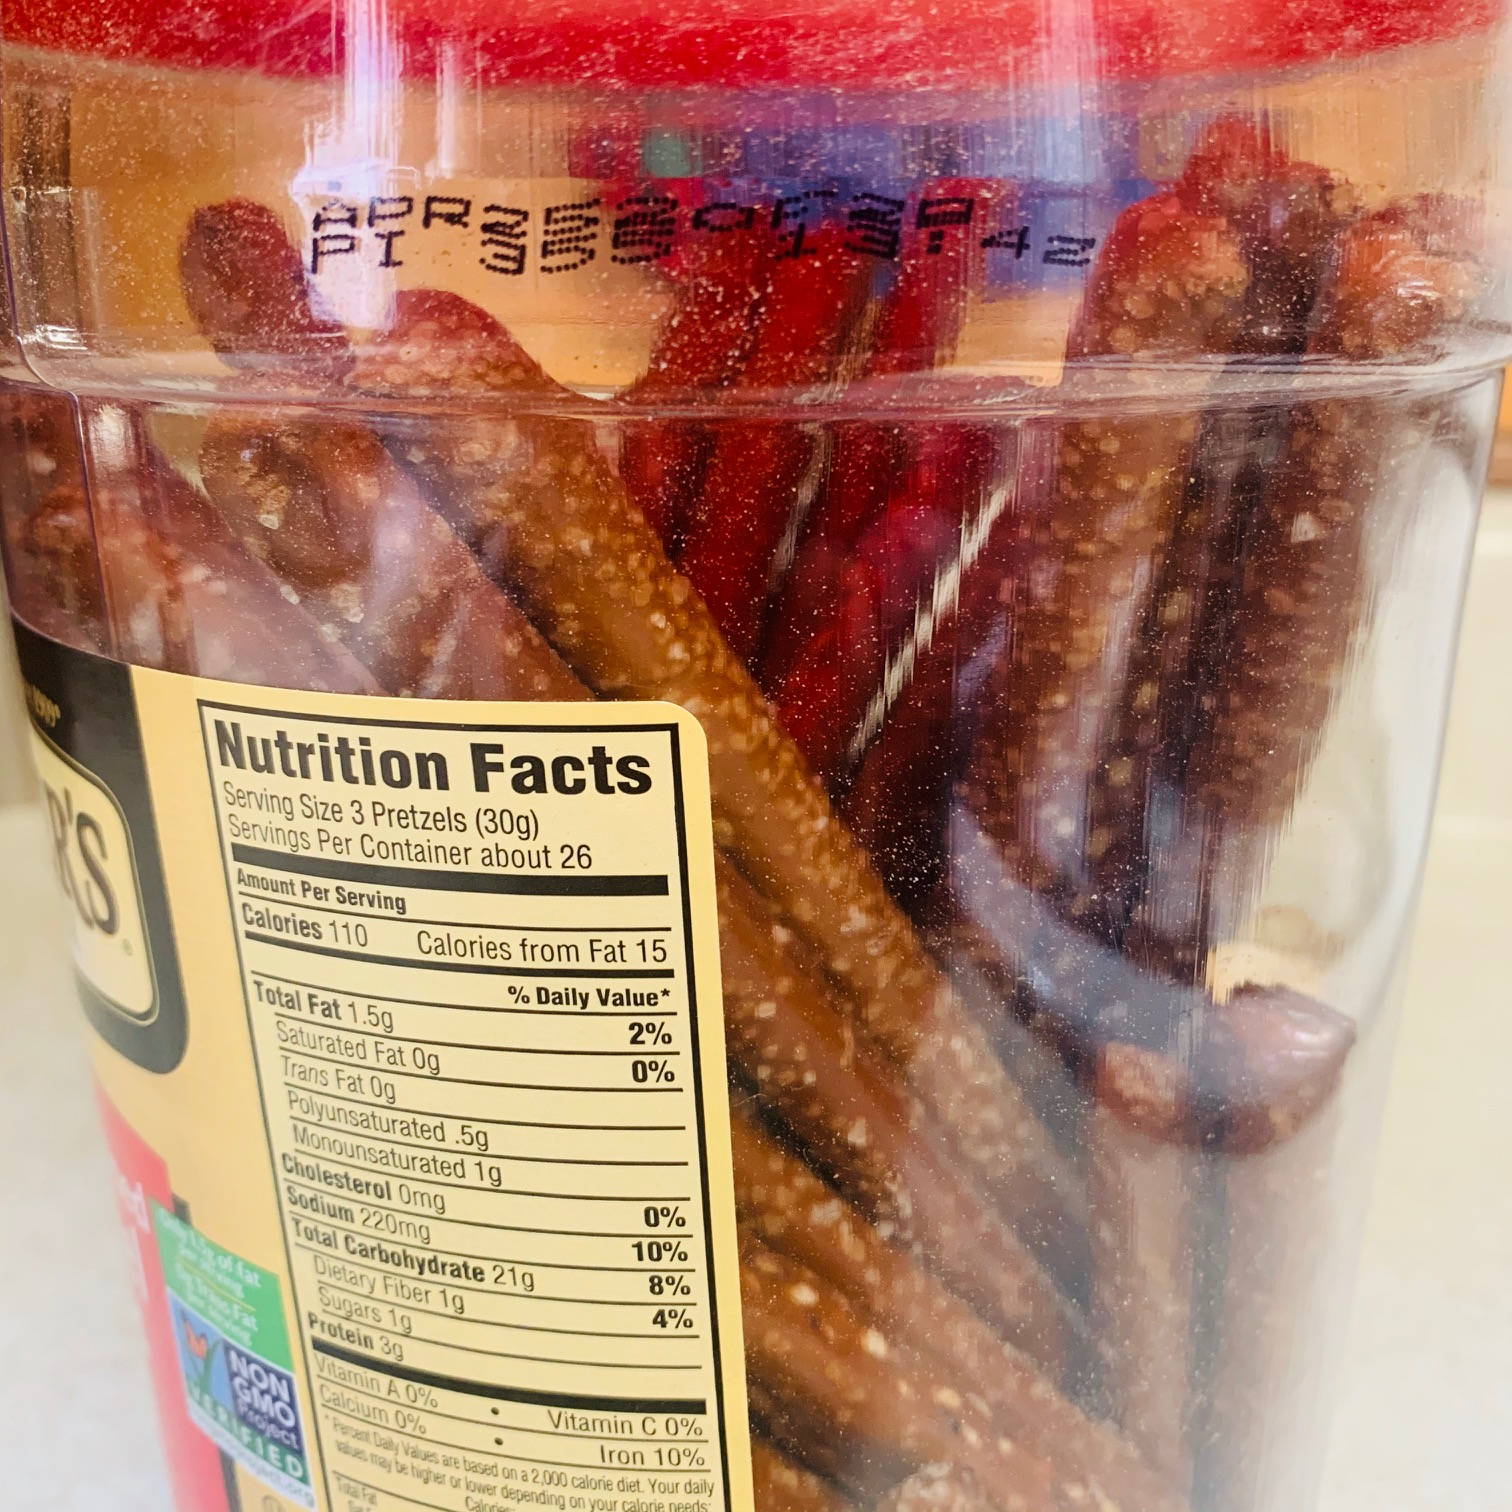 Container of pretzels